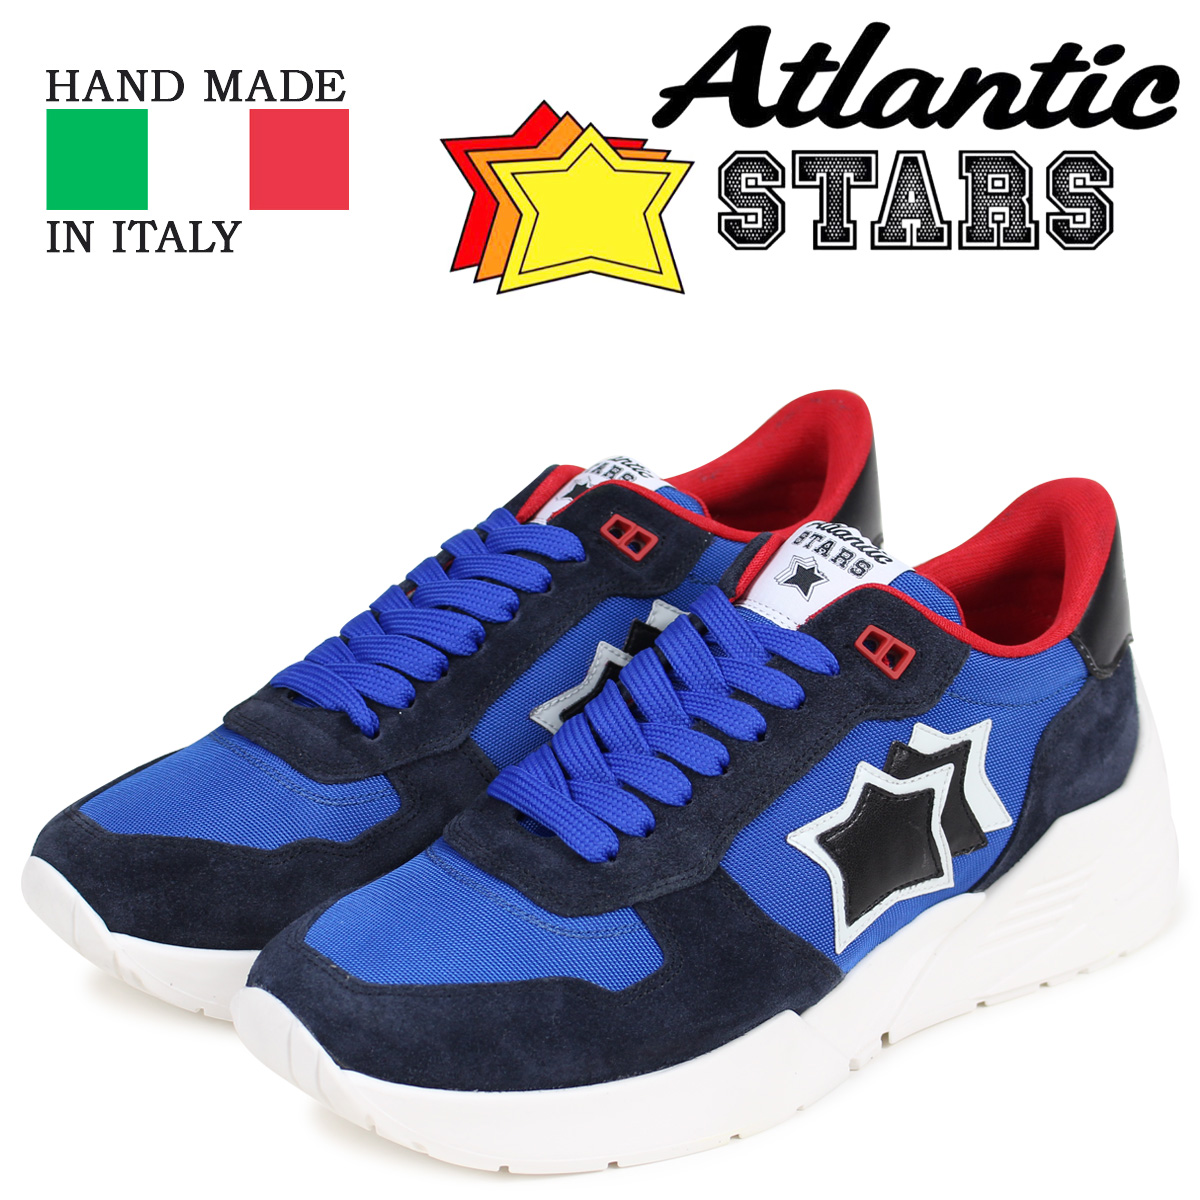 Atlantic STARS アトランティックスターズ メンズ スニーカー マーズ MARS AN-SN12 ブルー